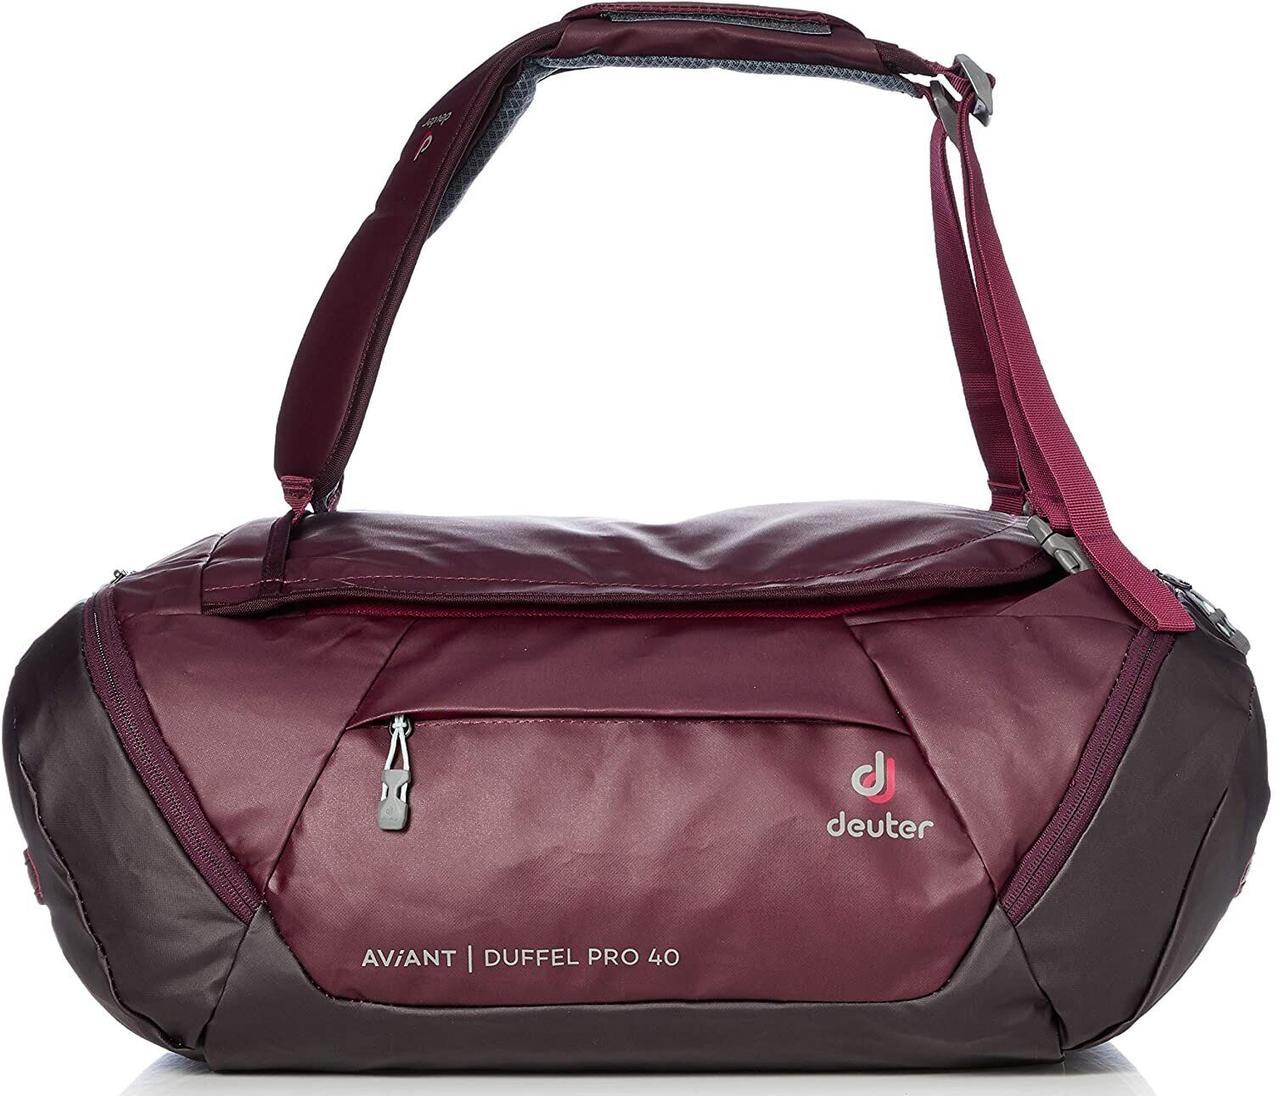 Сумка дорожная Deuter Aviant Duffel Pro 40 maron-aubergine (3521020 5543)